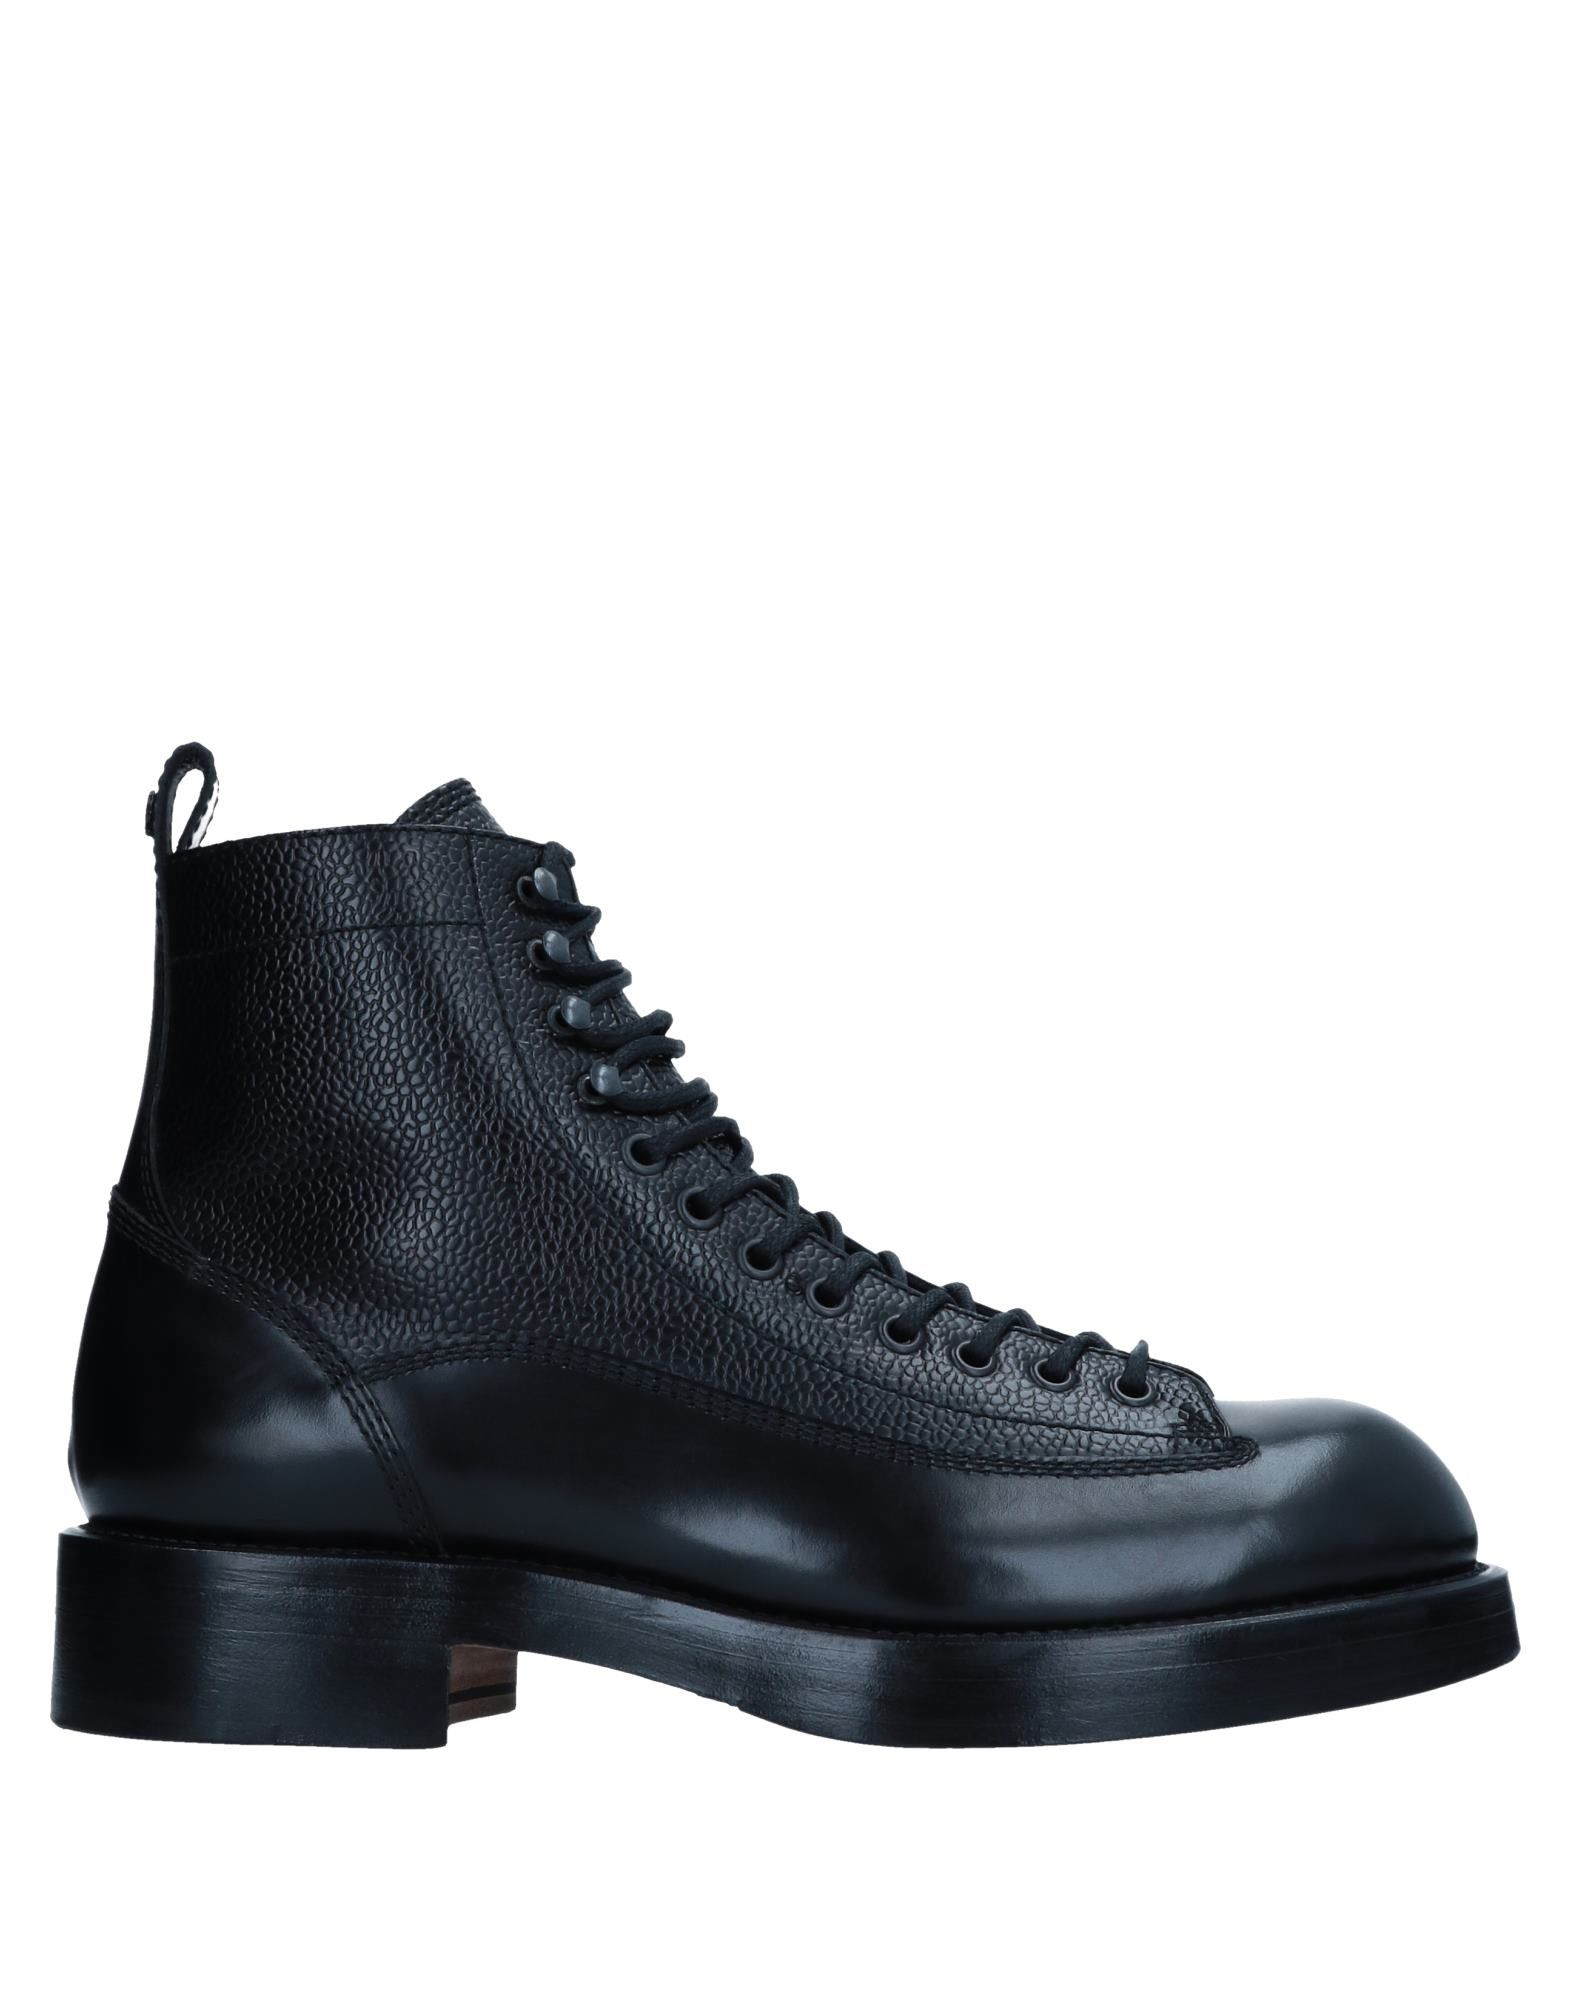 Dsquared2 Stiefelette Herren  11553837NV Schuhe Gute Qualität beliebte Schuhe 11553837NV 7c9d0a